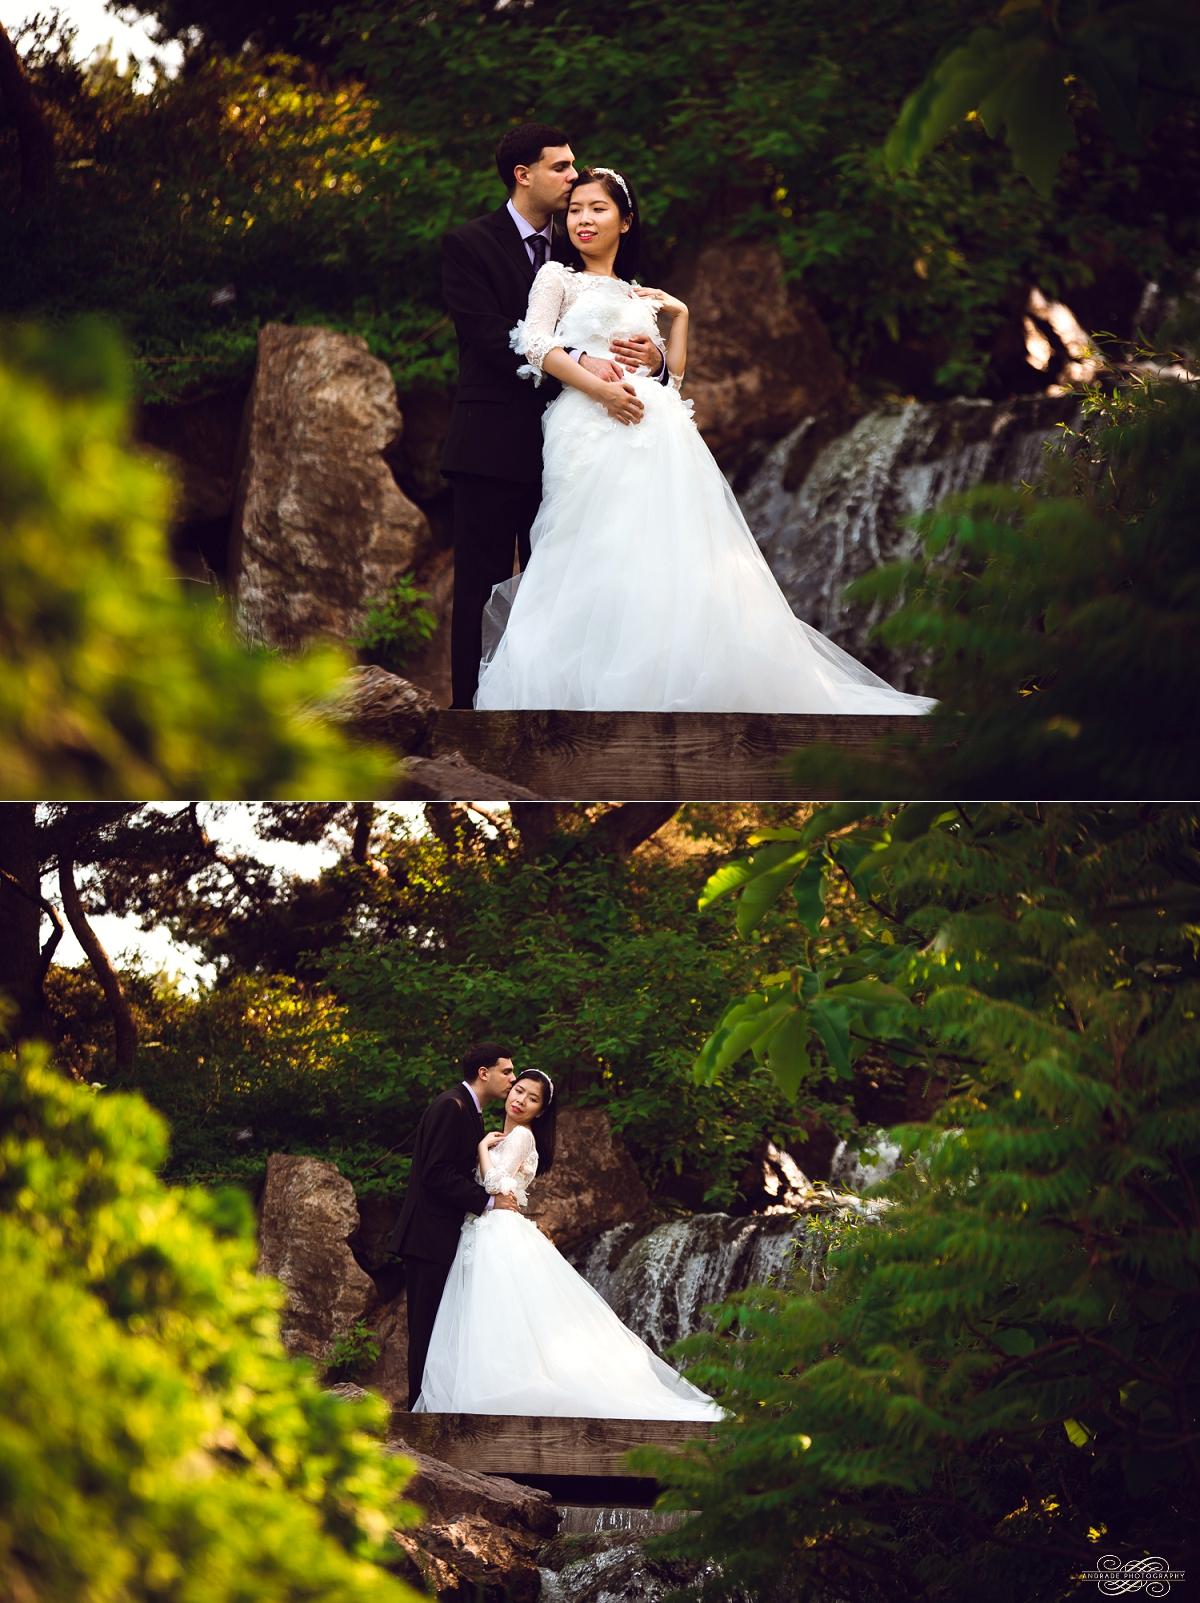 Chicago botanic gardens bridal session fine art photography_0014.jpg